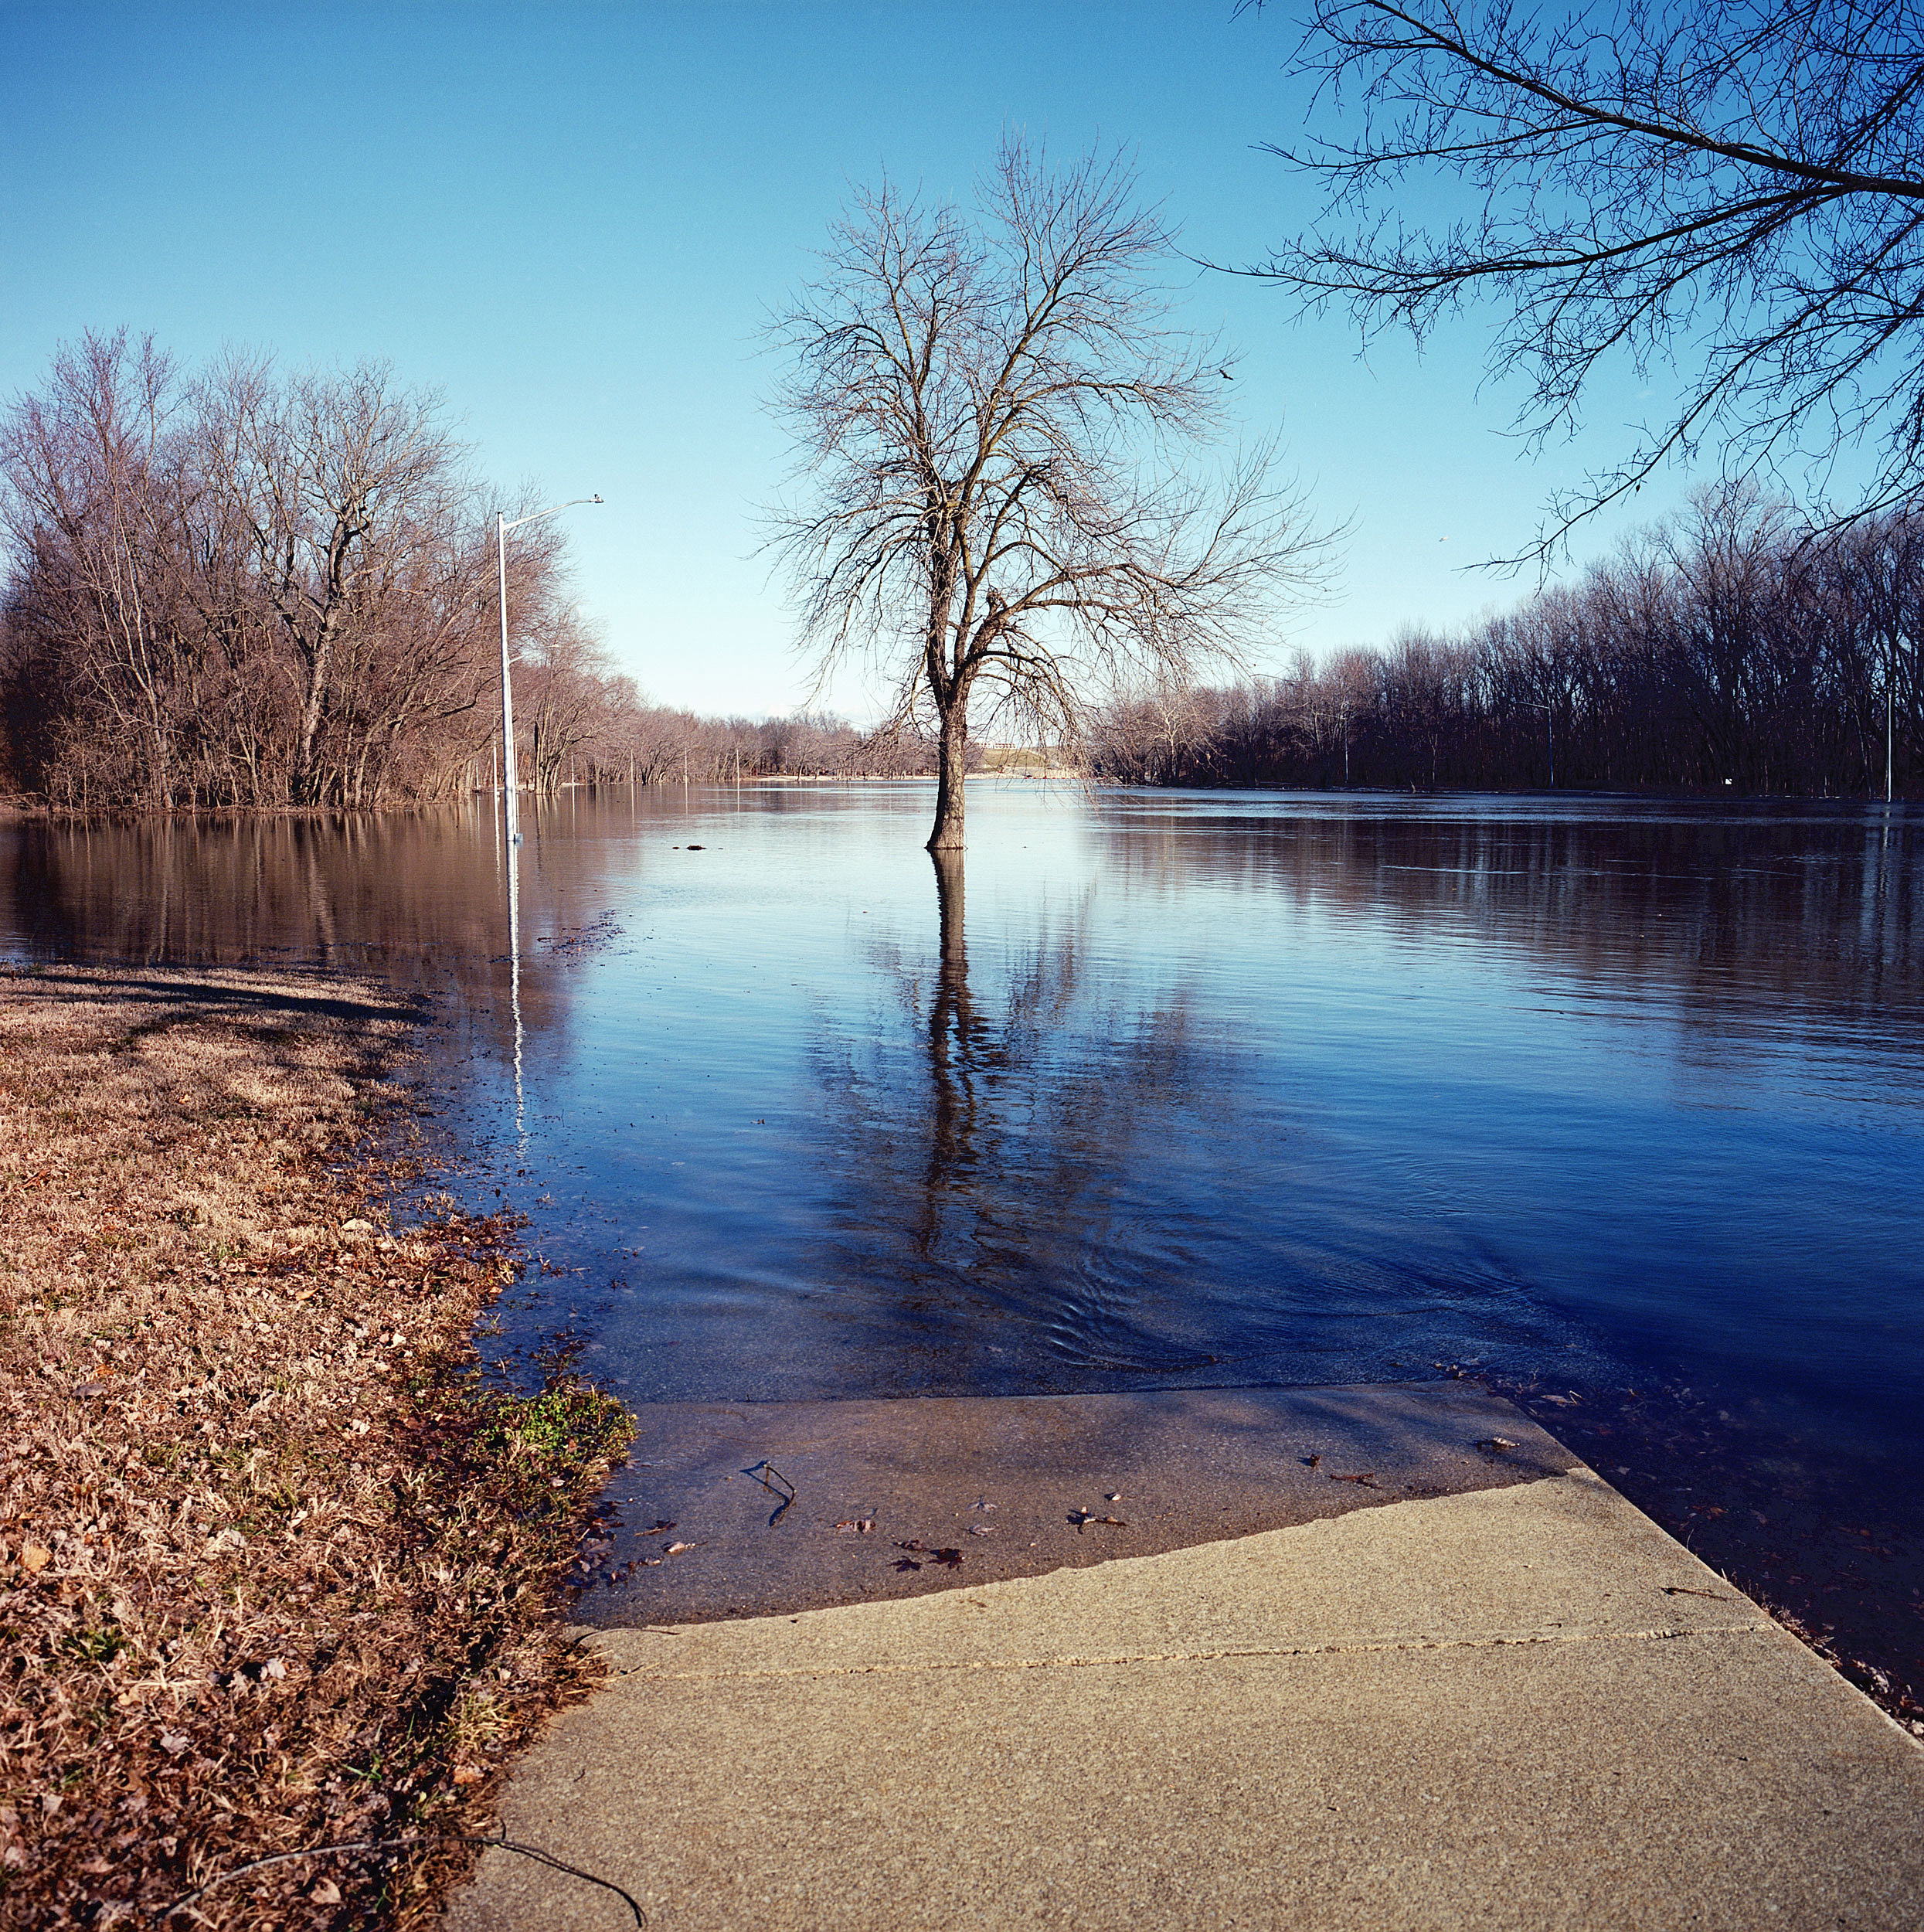 Kaskaskia river, Carlyle, Illinois.